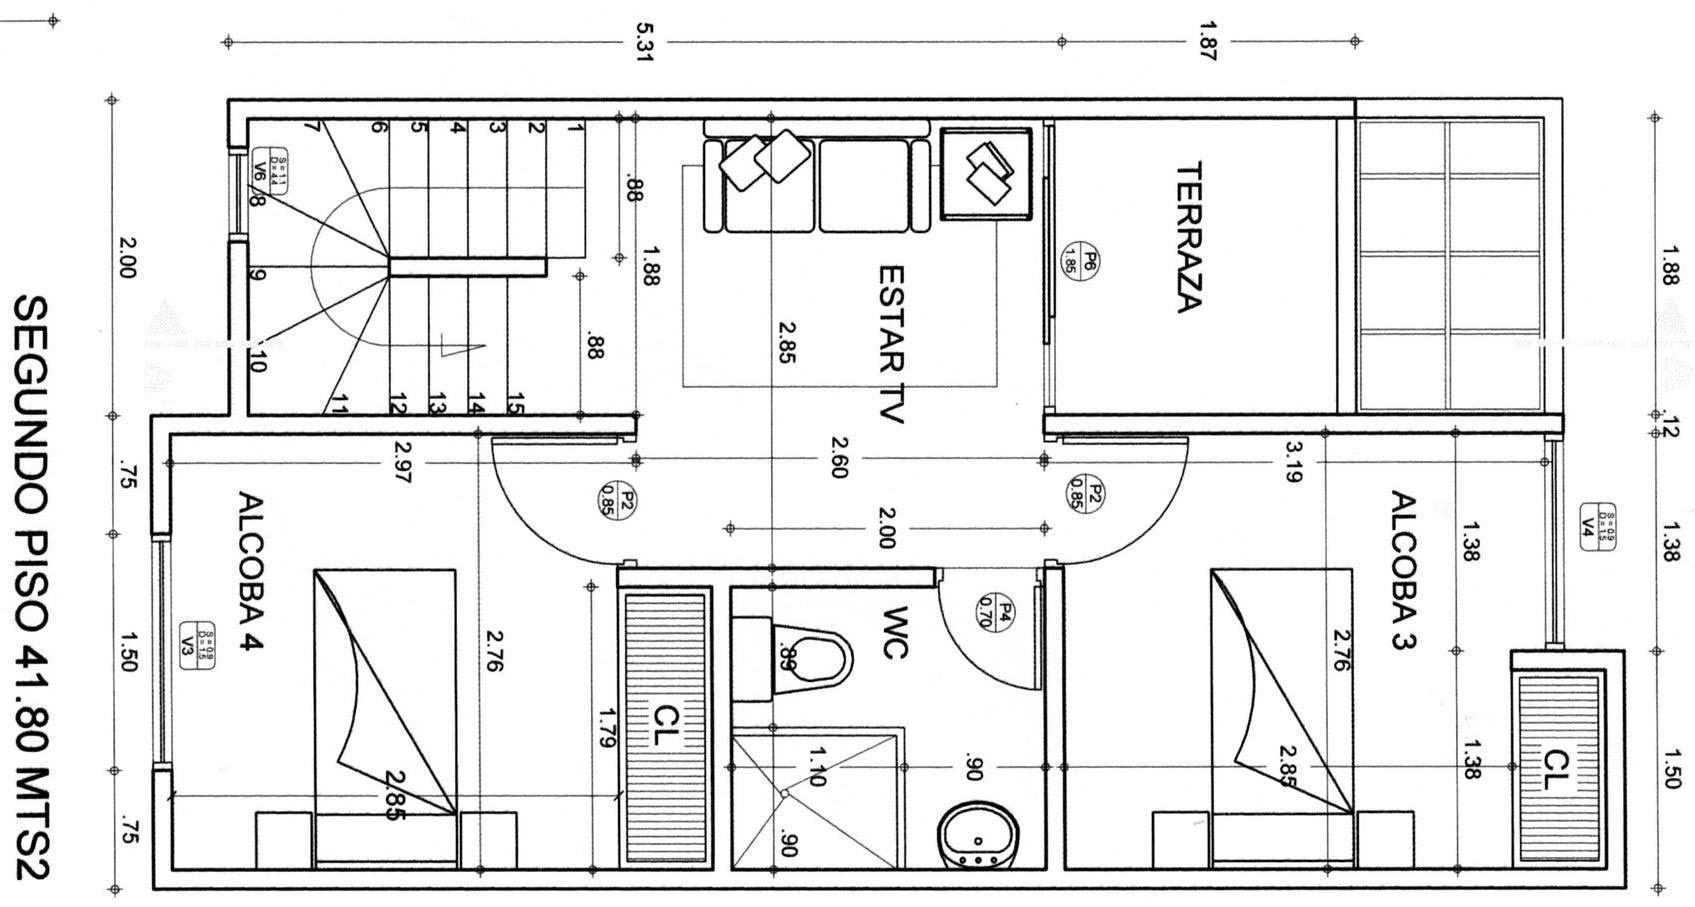 Planos arquitectonicos gratis buscar con google diana for Libros de planos arquitectonicos